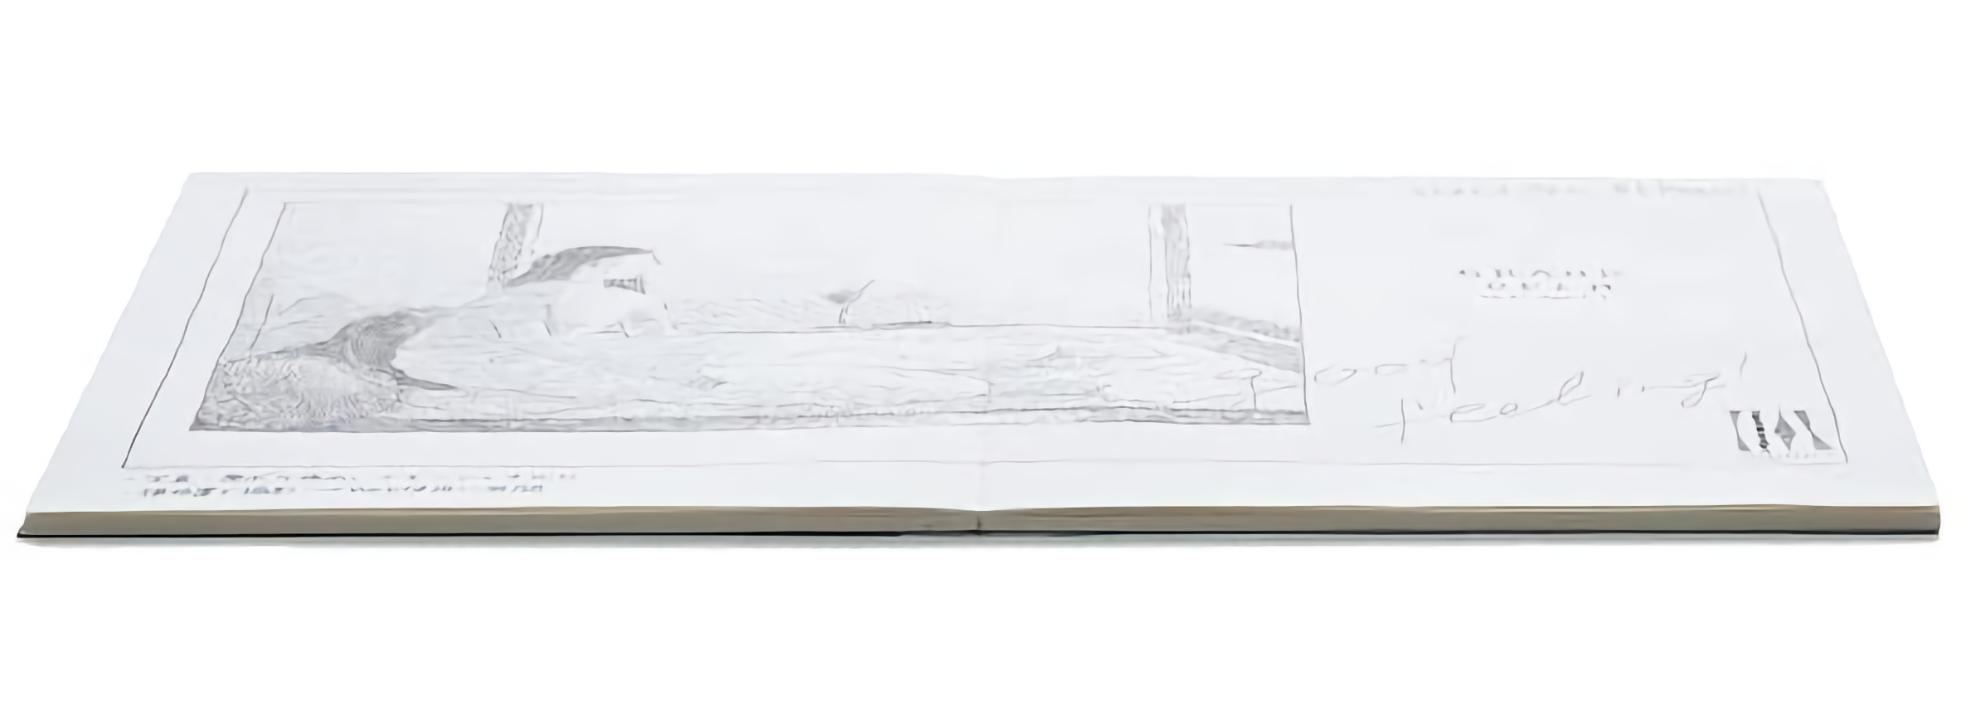 Kokuyo PERPANEP Notebook - Zara Zara A5 4 mm Dot grid